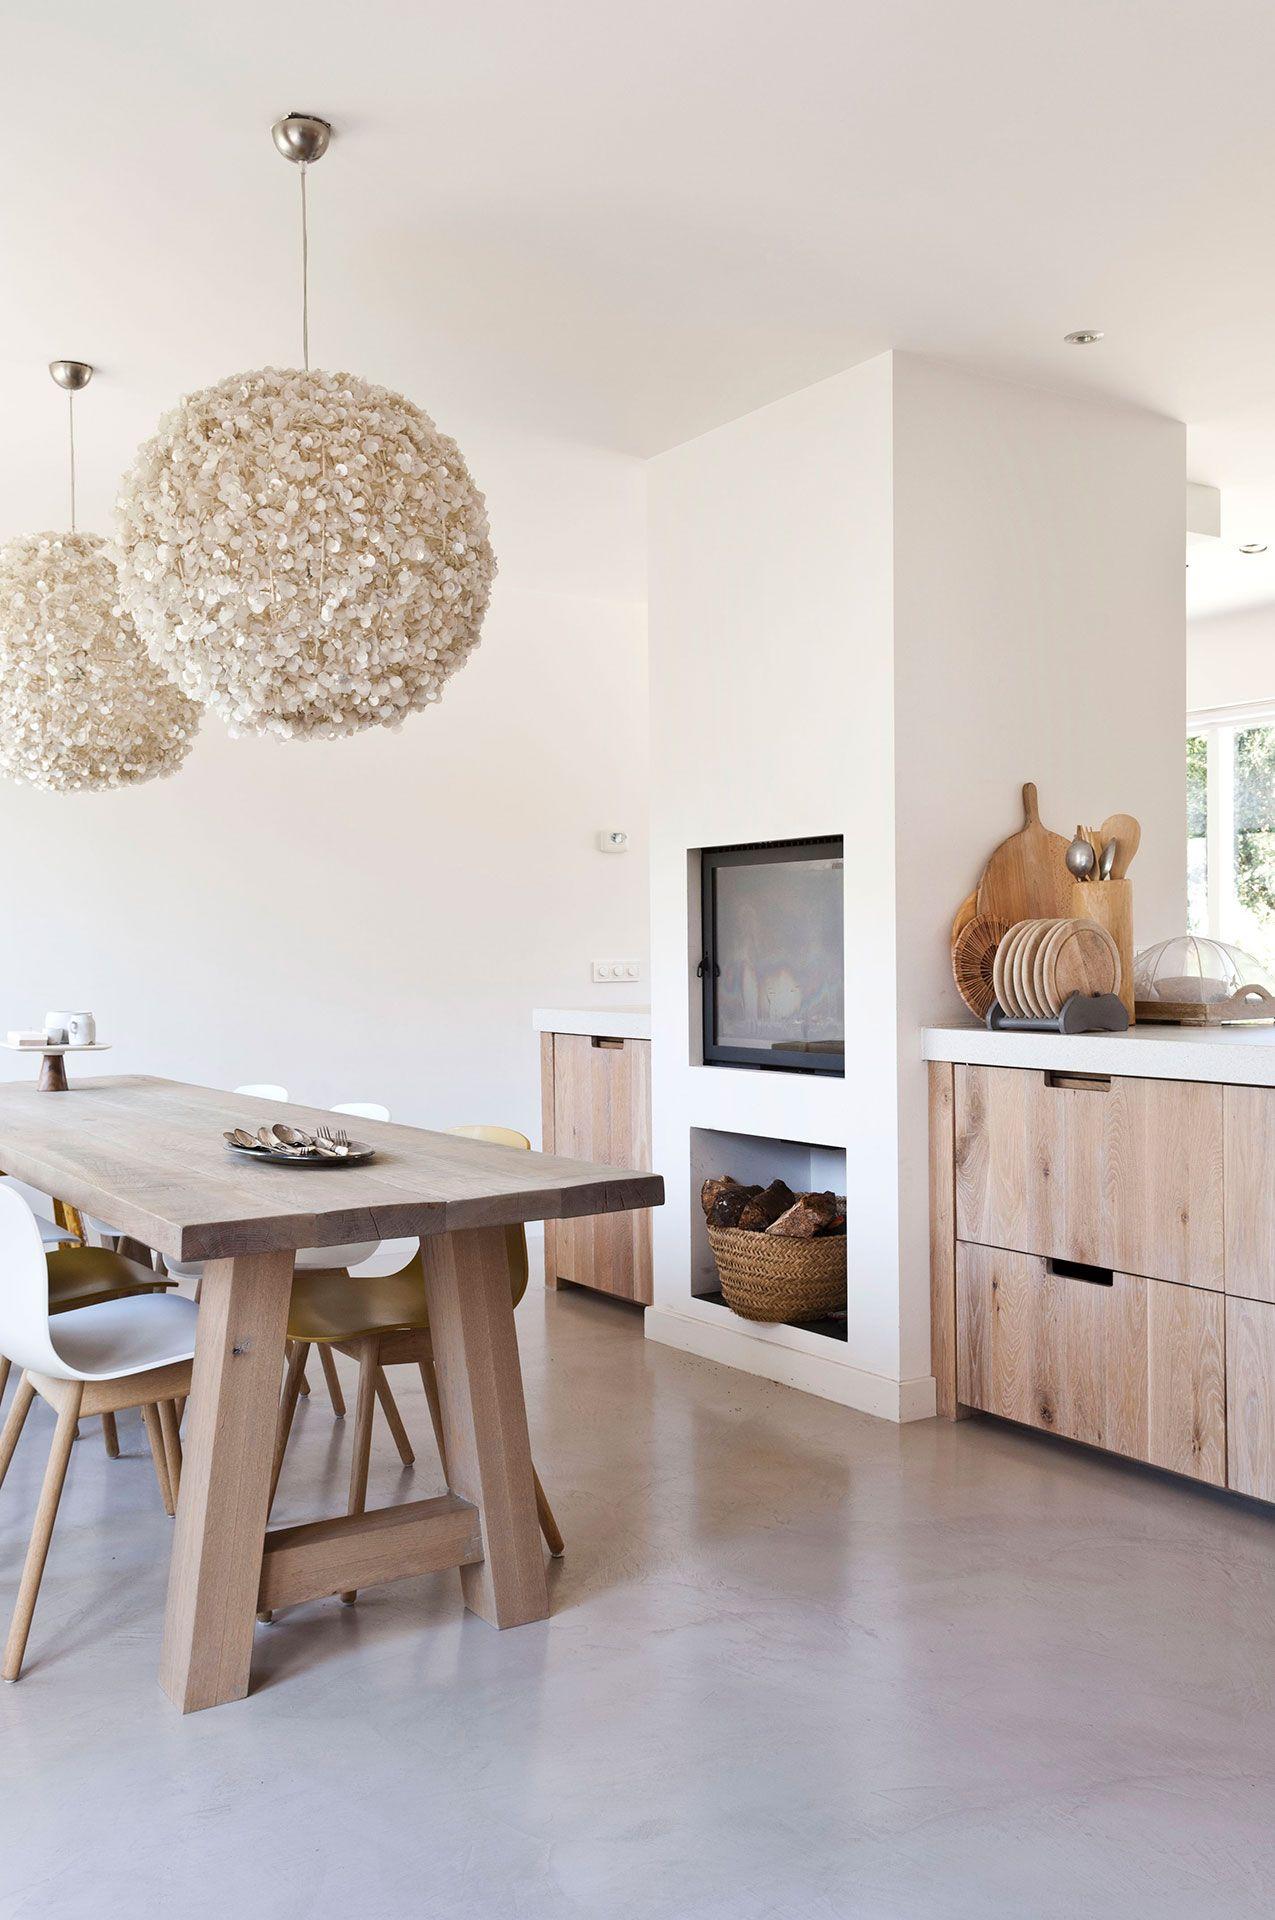 Village home interior design houten keukeneiland  home decor  pinterest  interiors kitchens